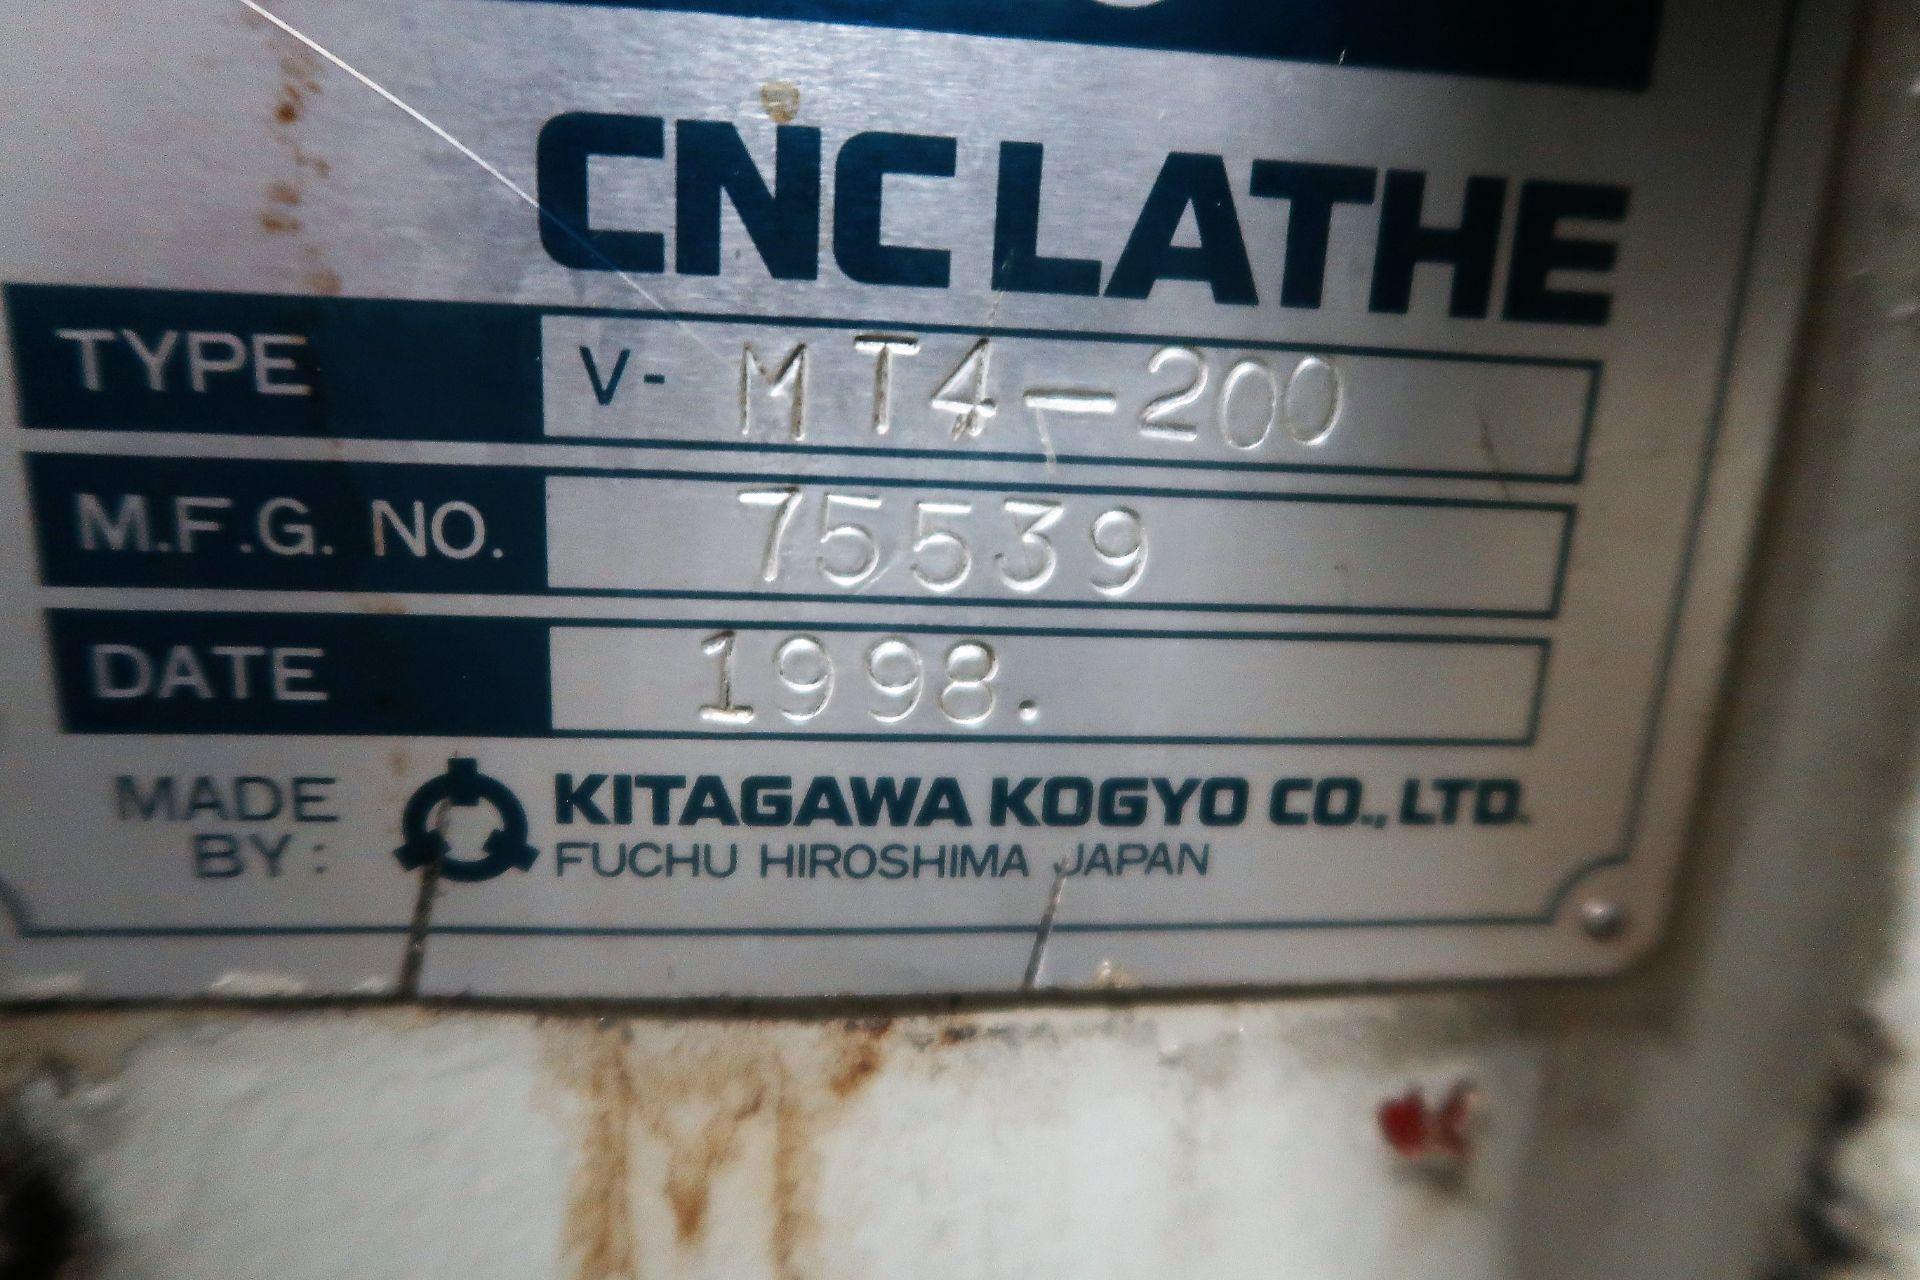 Lot 33 - Kitako MT4-200 4 Spindle CNC Horizontal Turning Center Chucking Lathe, S/N 103-75532